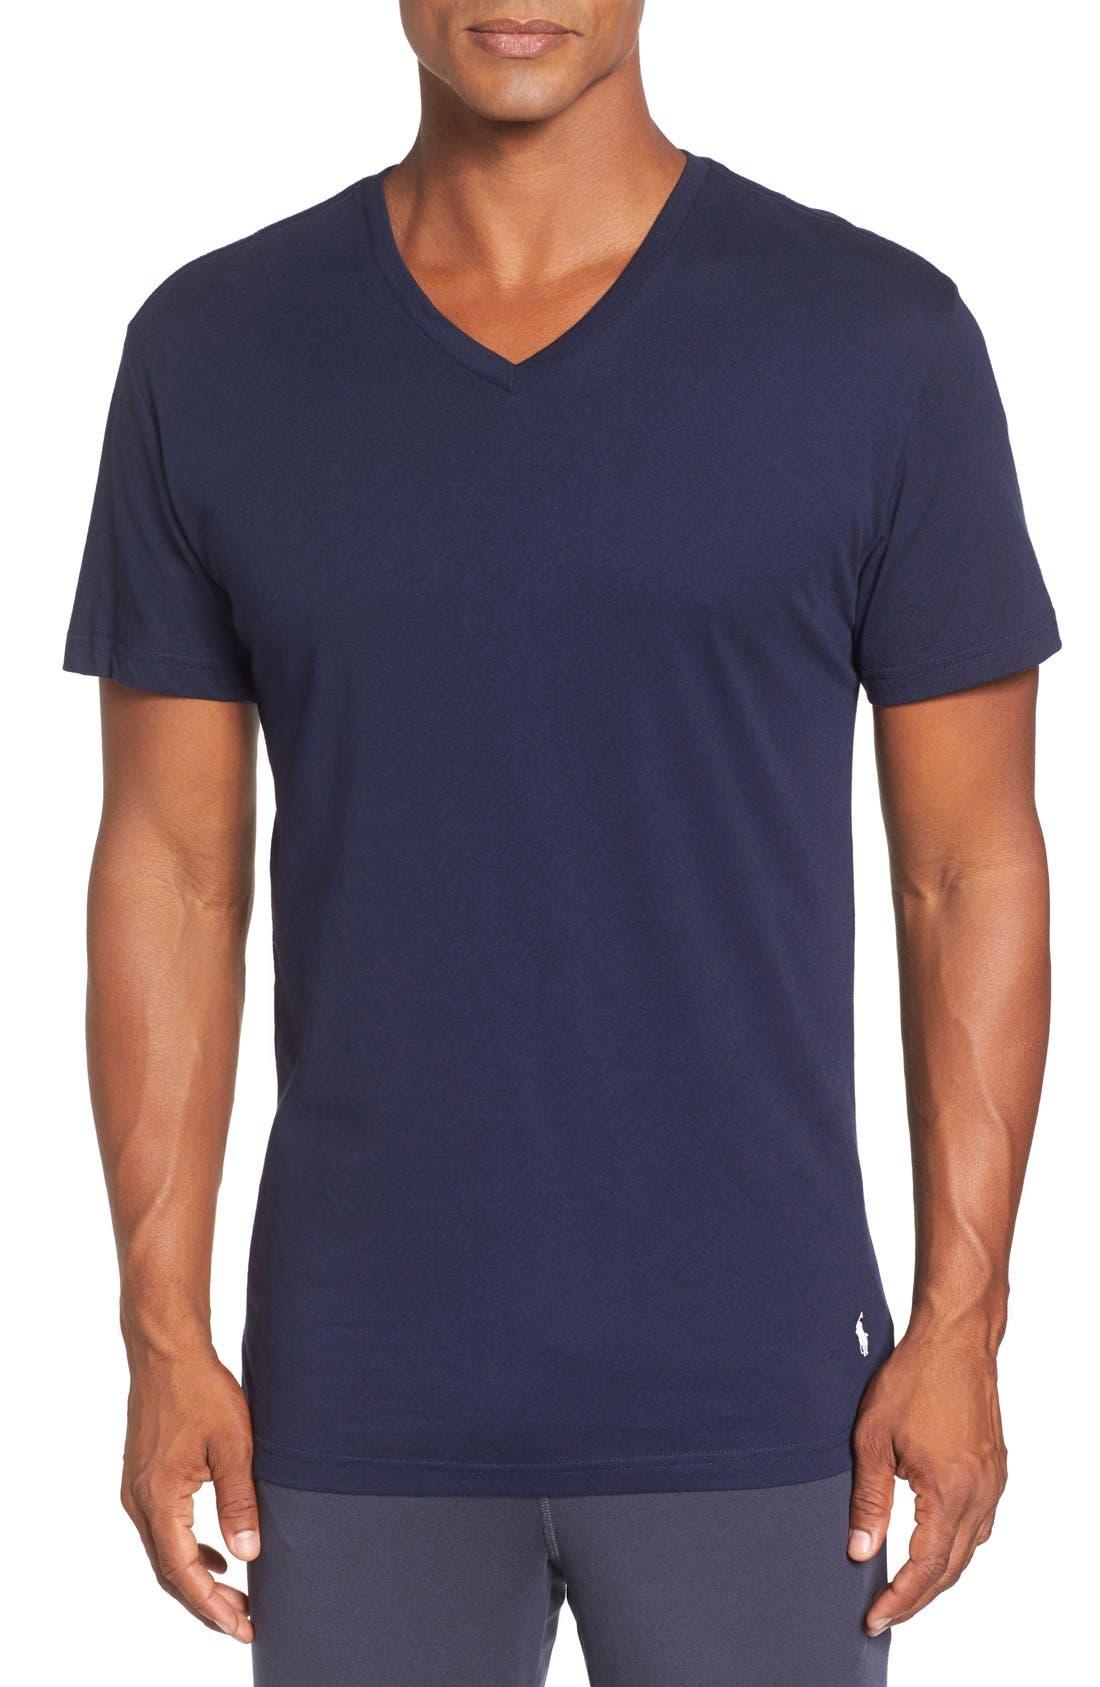 Alternate Image 2  - Polo Ralph Lauren 3-Pack Trim Fit T-Shirt